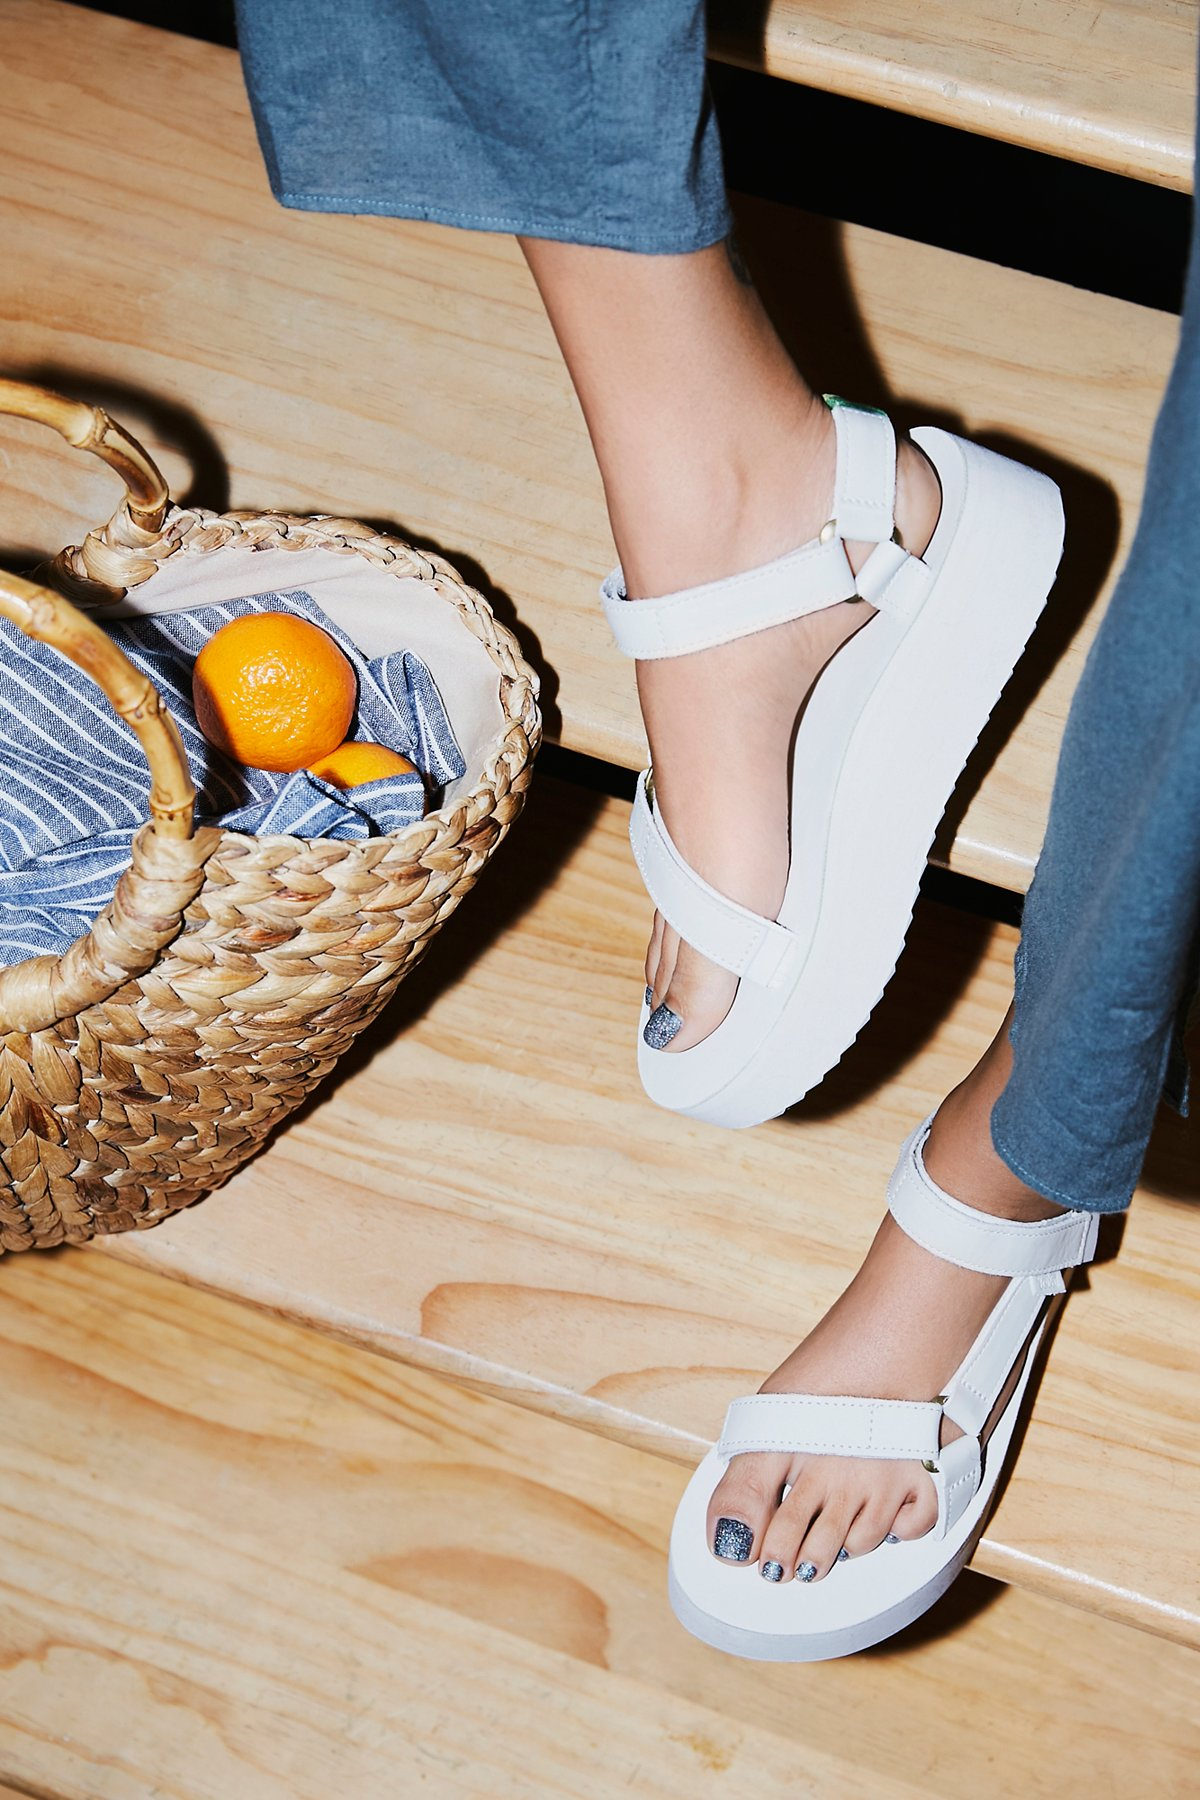 Universal Crafted Teva厚底凉鞋